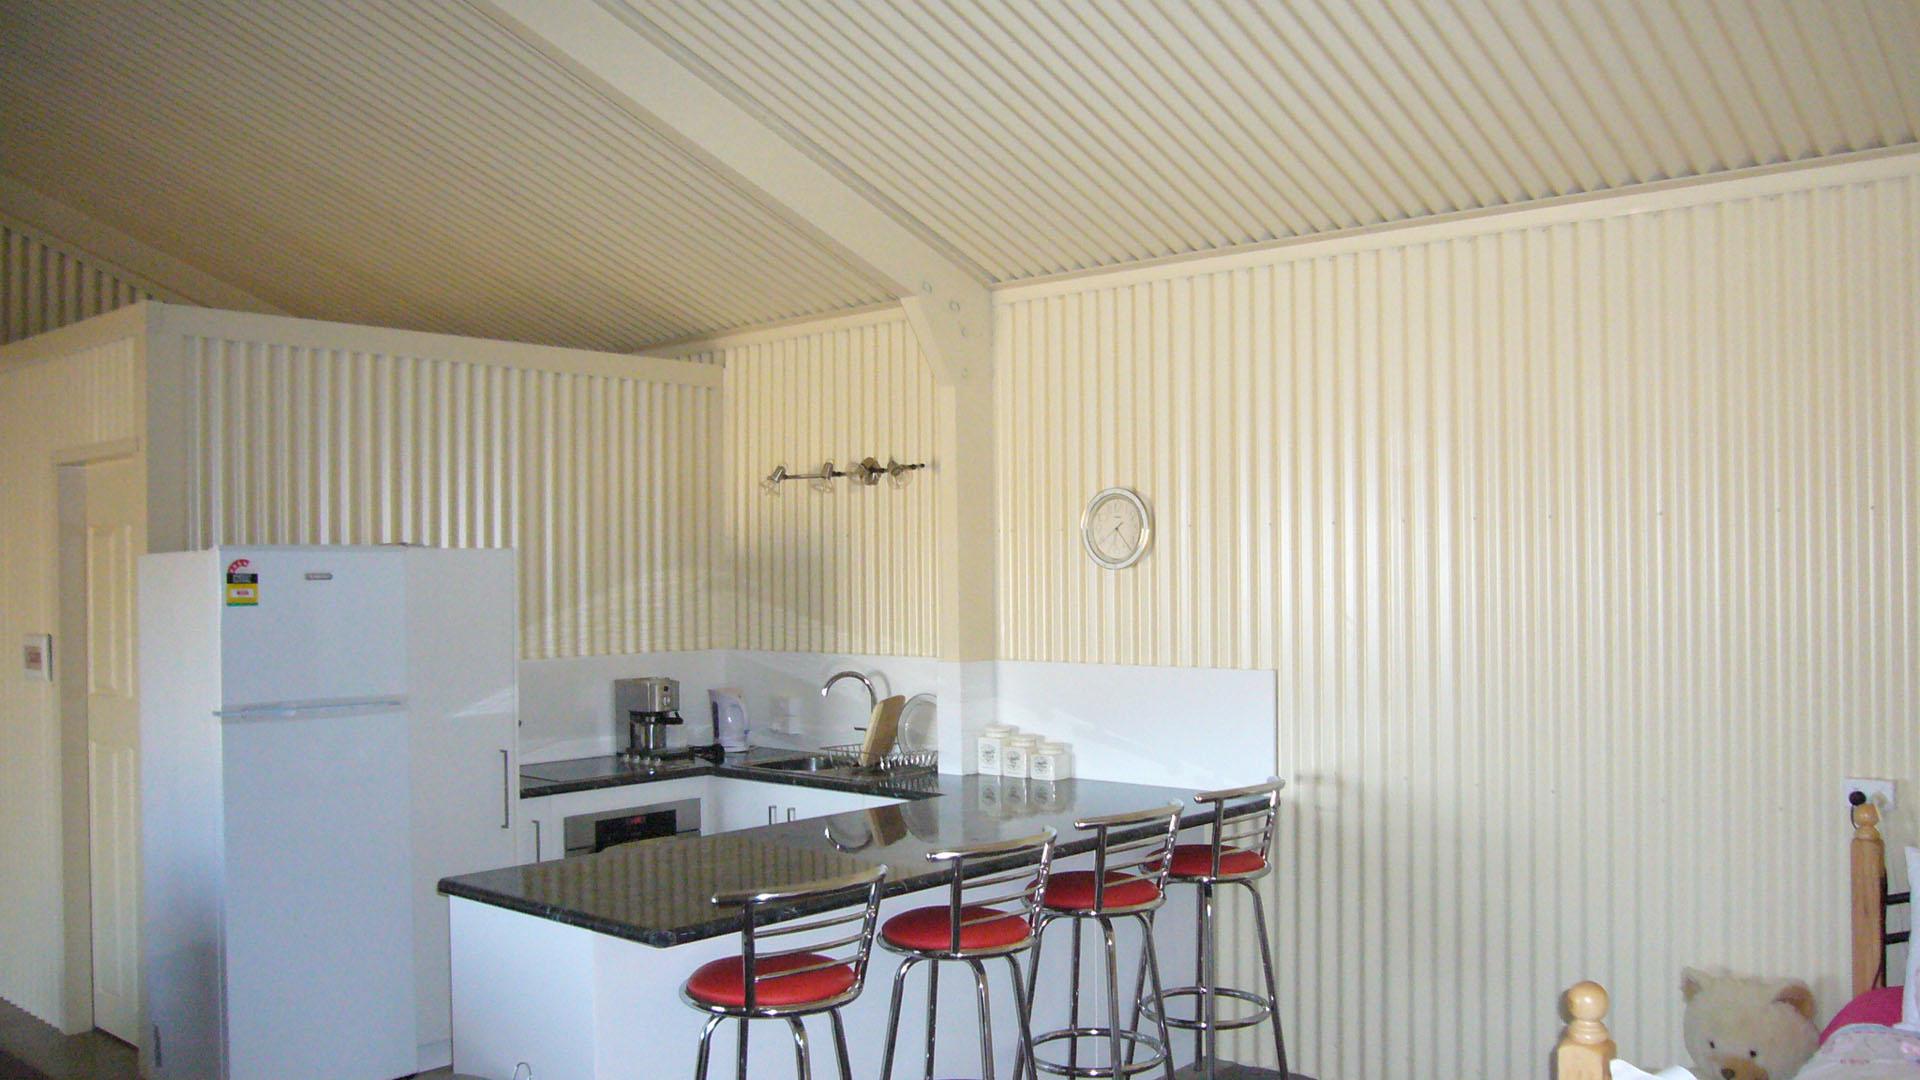 Garden Sheds and Garages